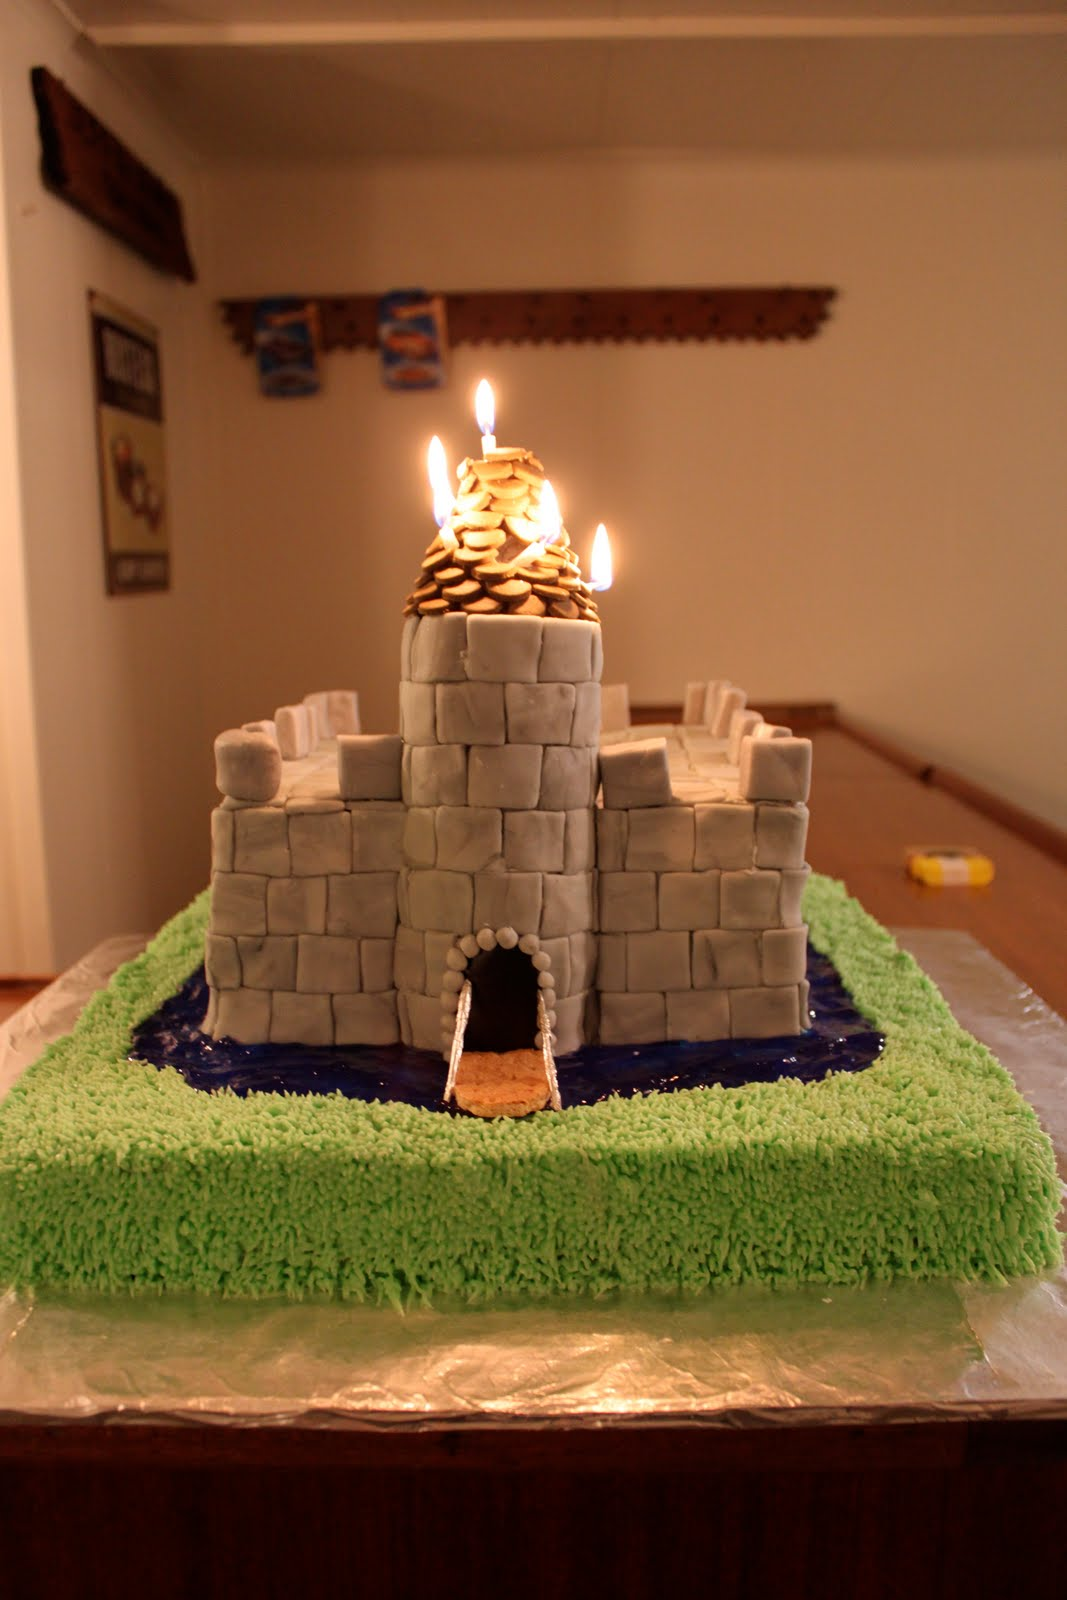 Creative Catharsis How To Robin Hood Birthday Cake